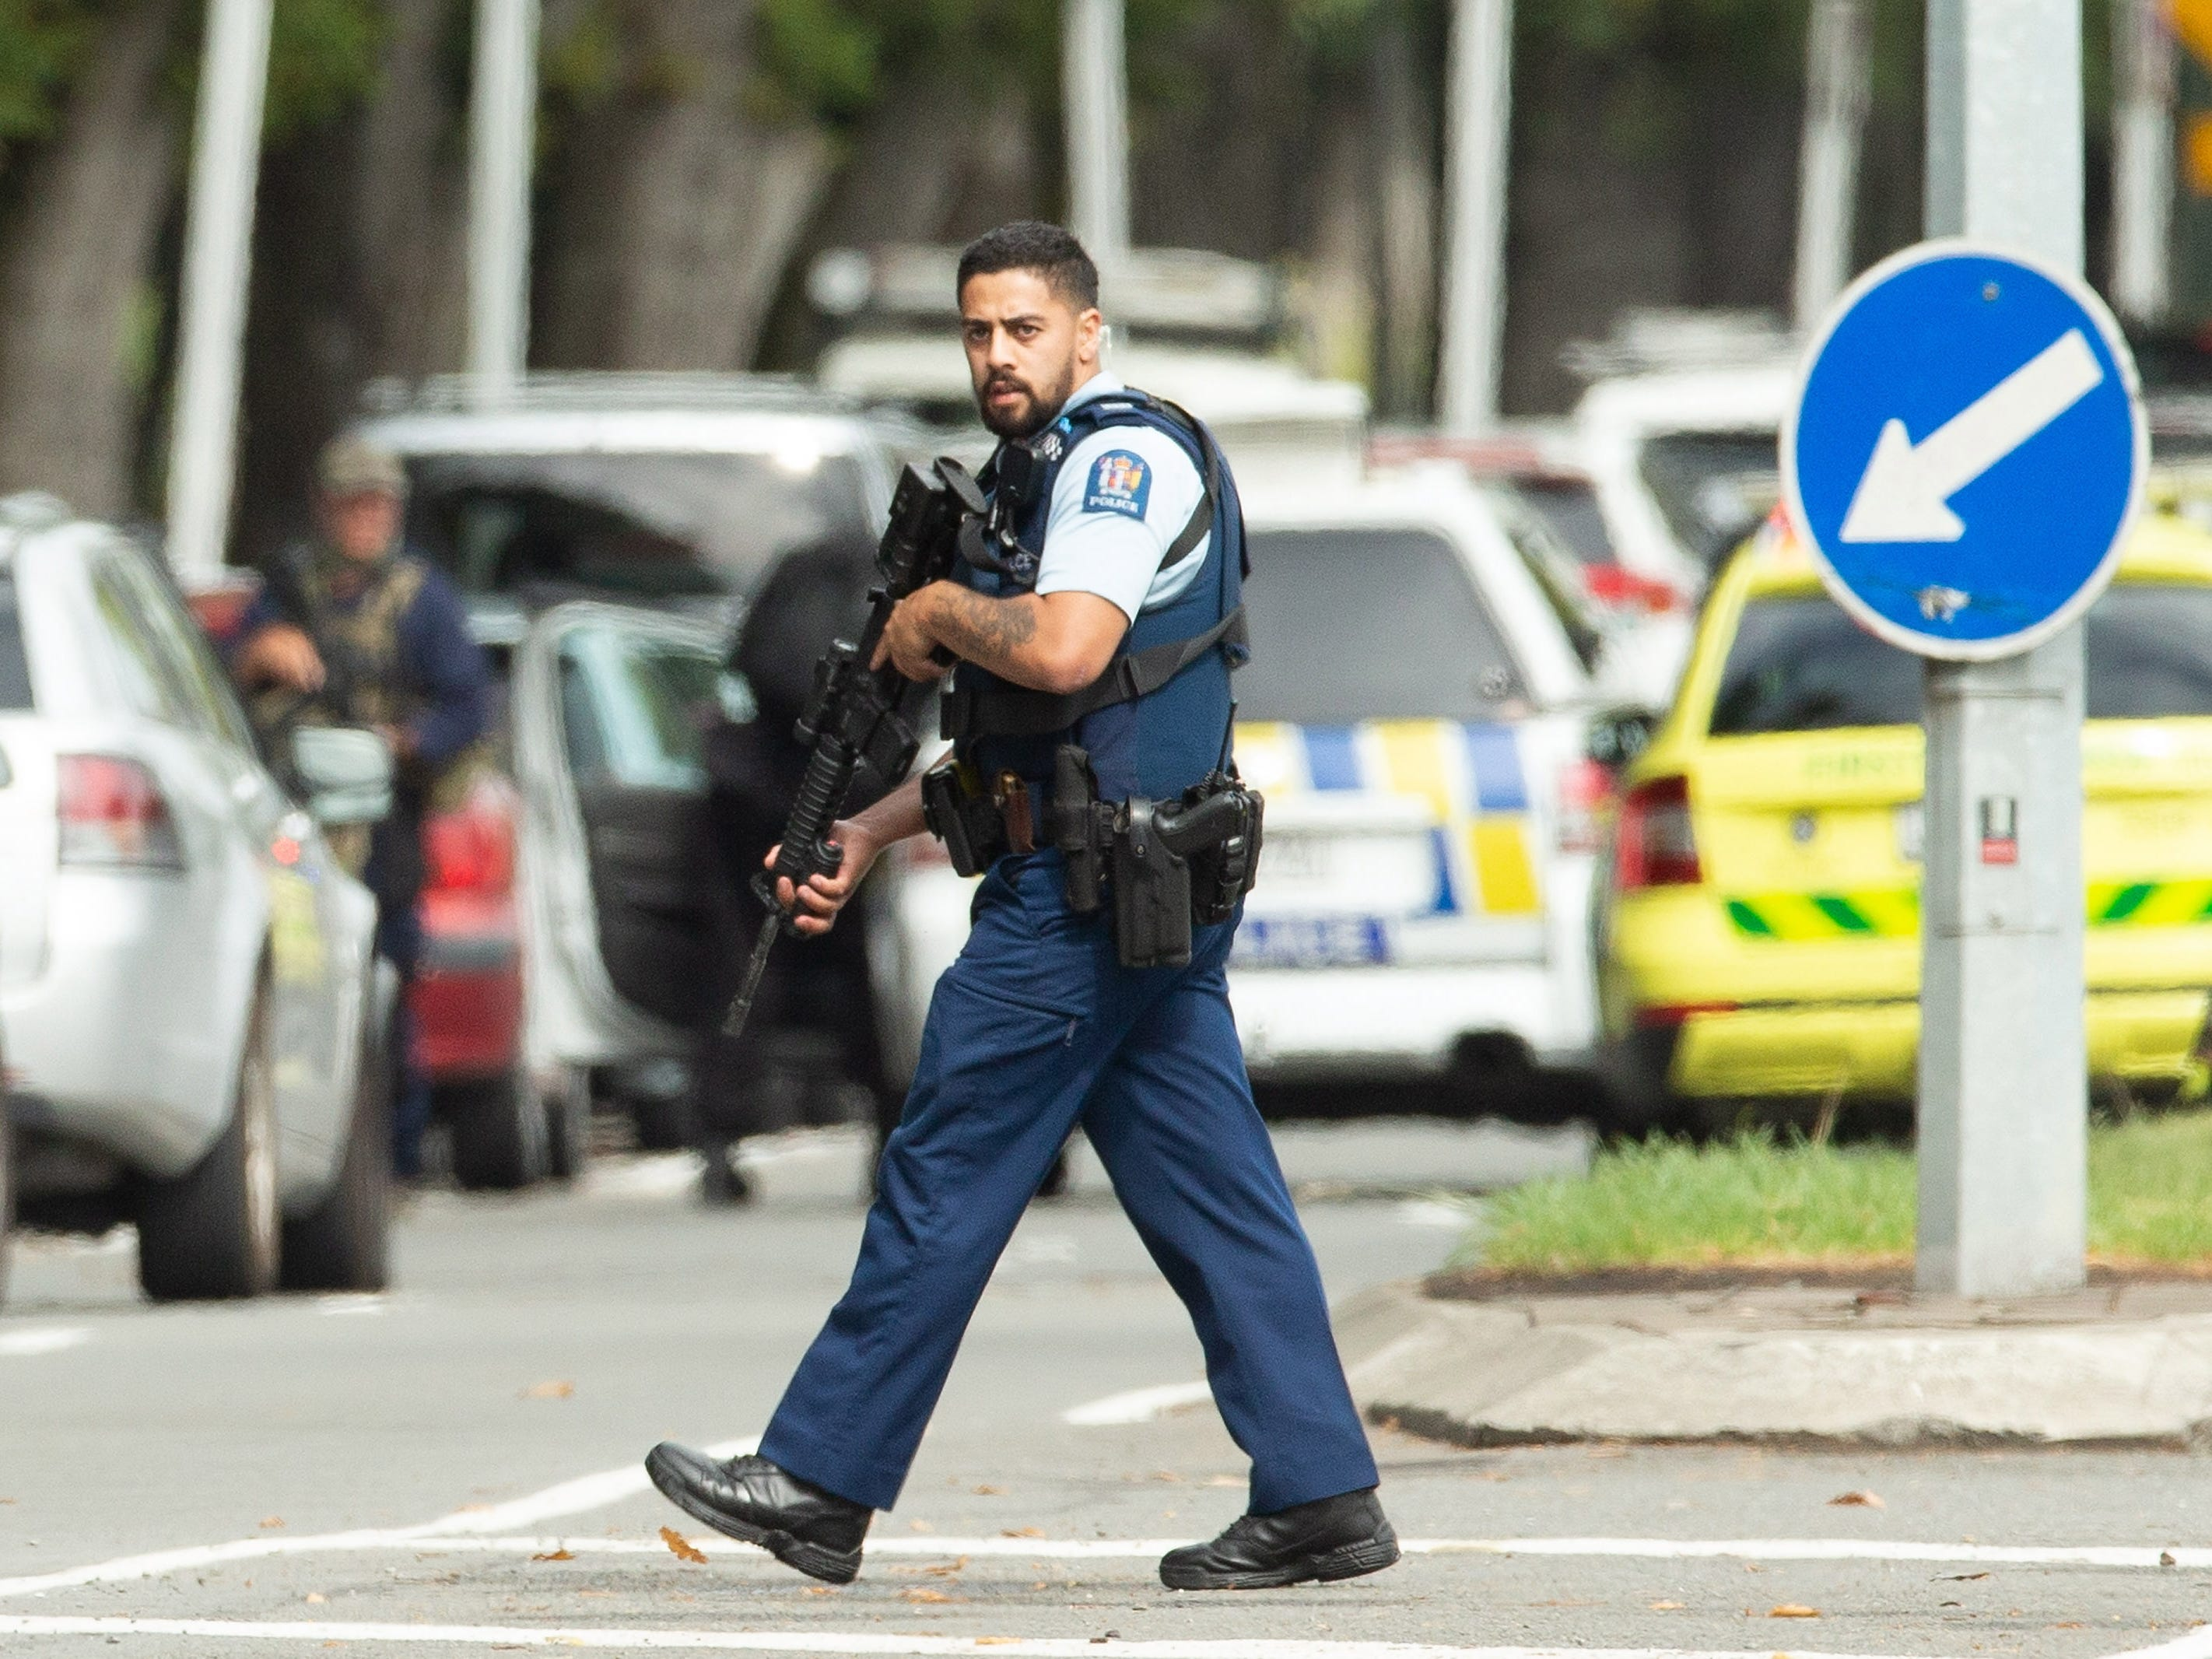 Media amplifiesNew Zealand shooting suspect's 'manifesto,' giving mass killers a platform